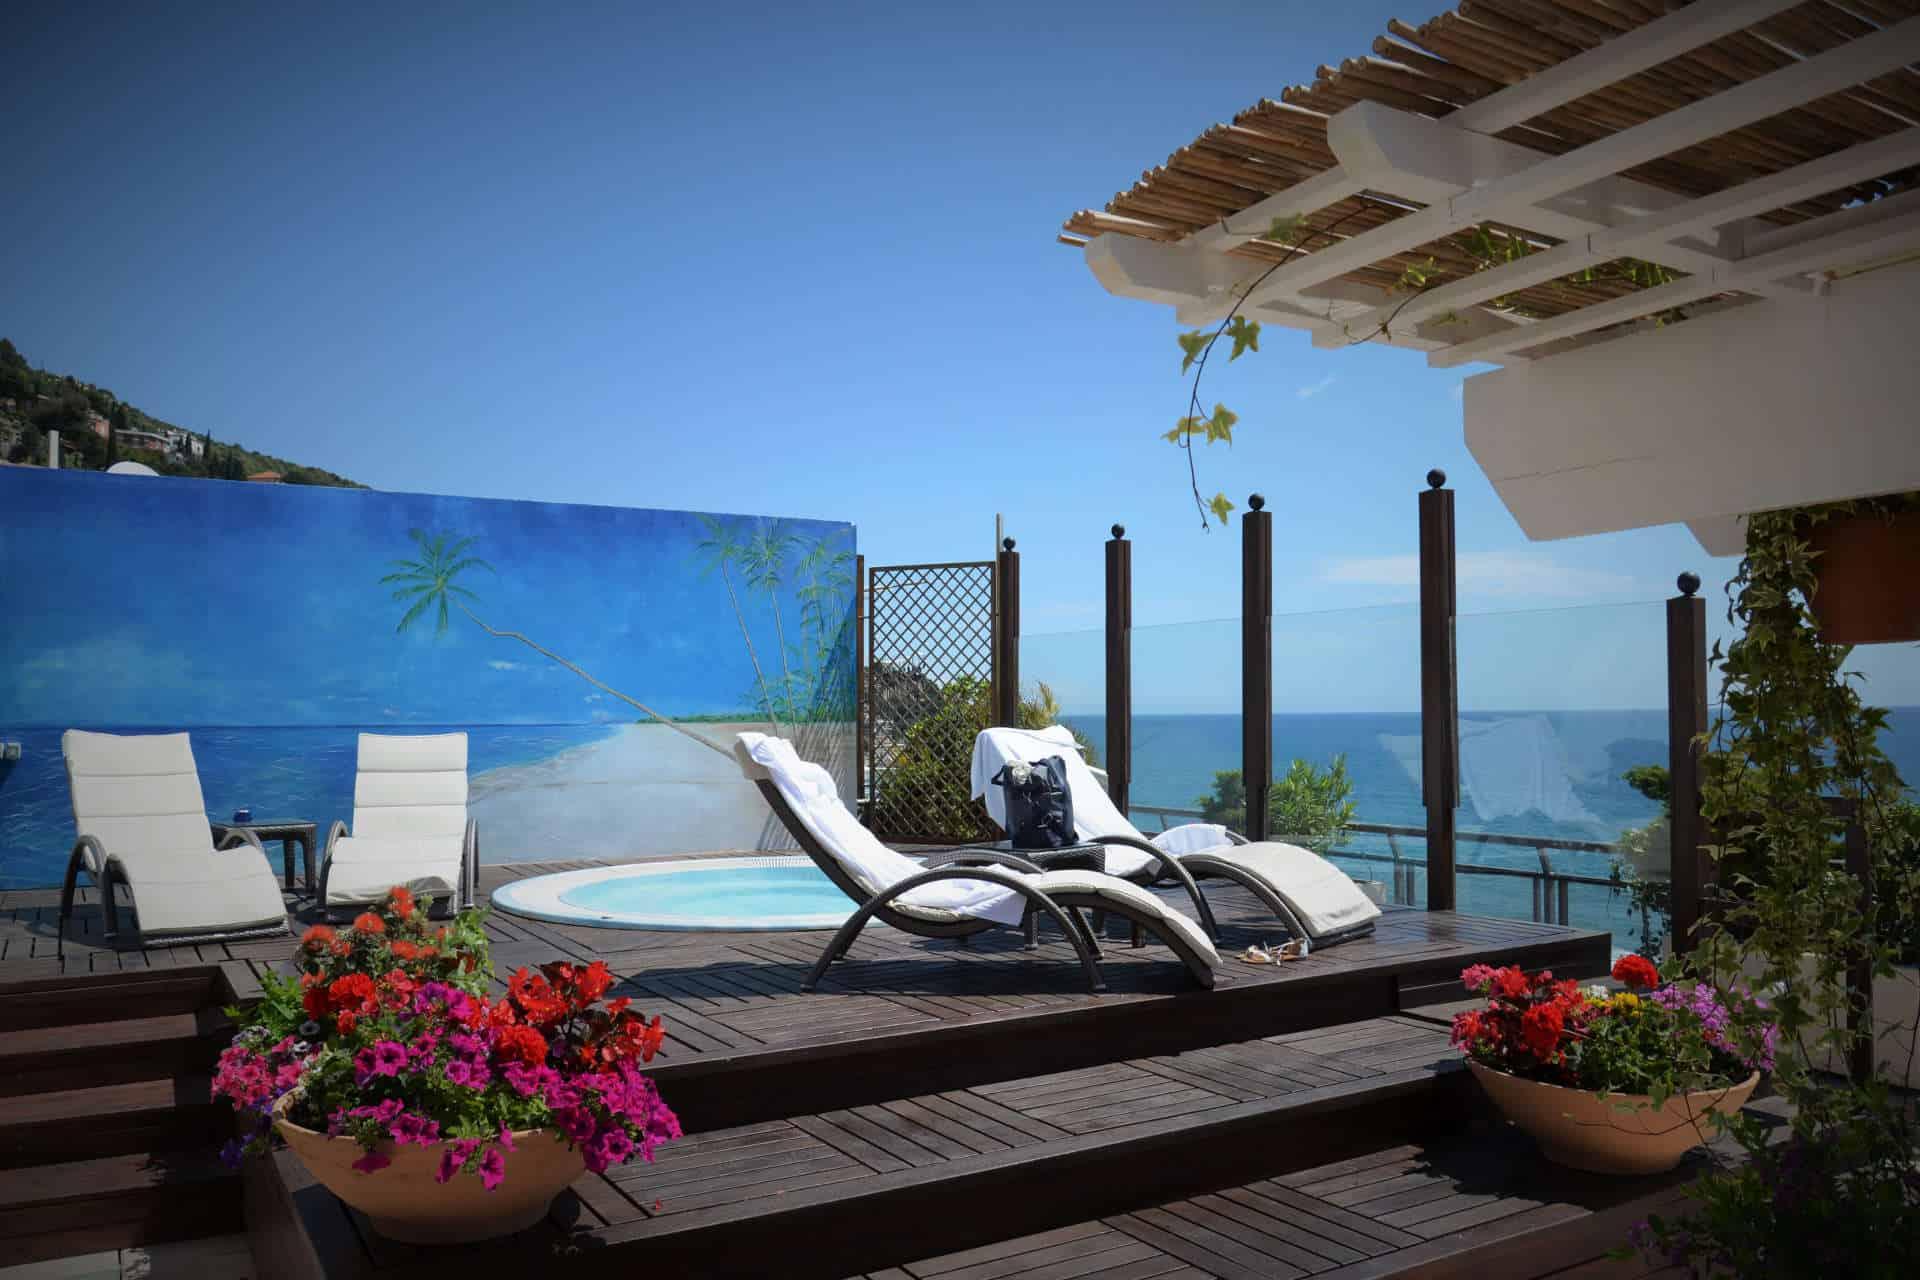 terrazza-hotel-regina | Hotel Regina Alassio